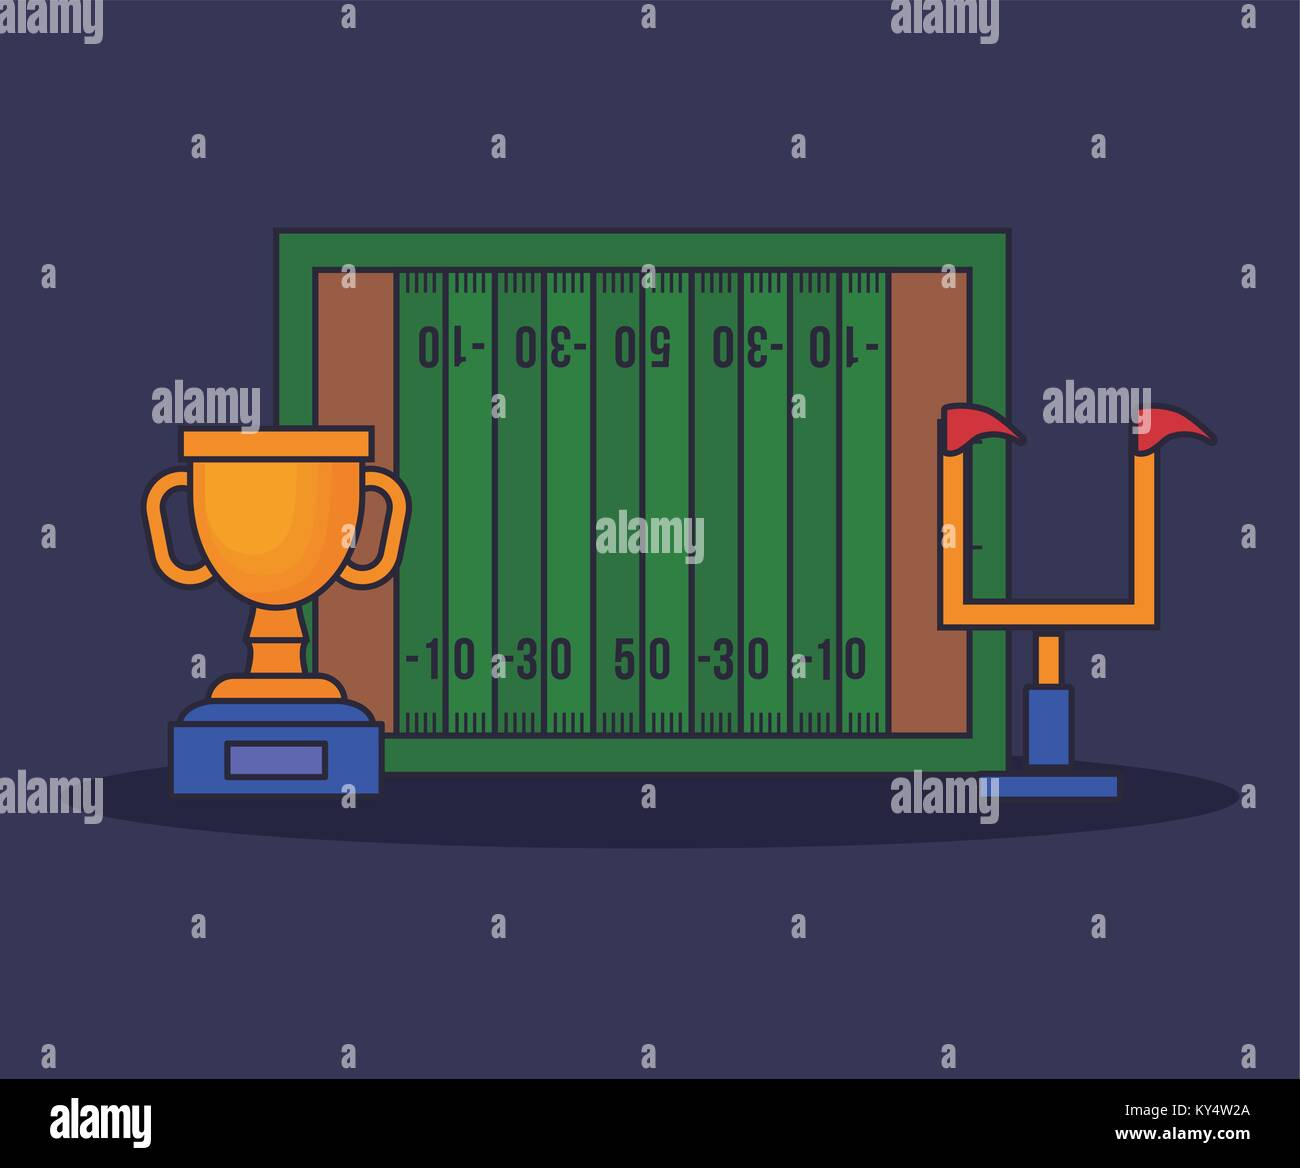 American Football Stadium Arena Vector Stock Photos Field Diagram Green Image